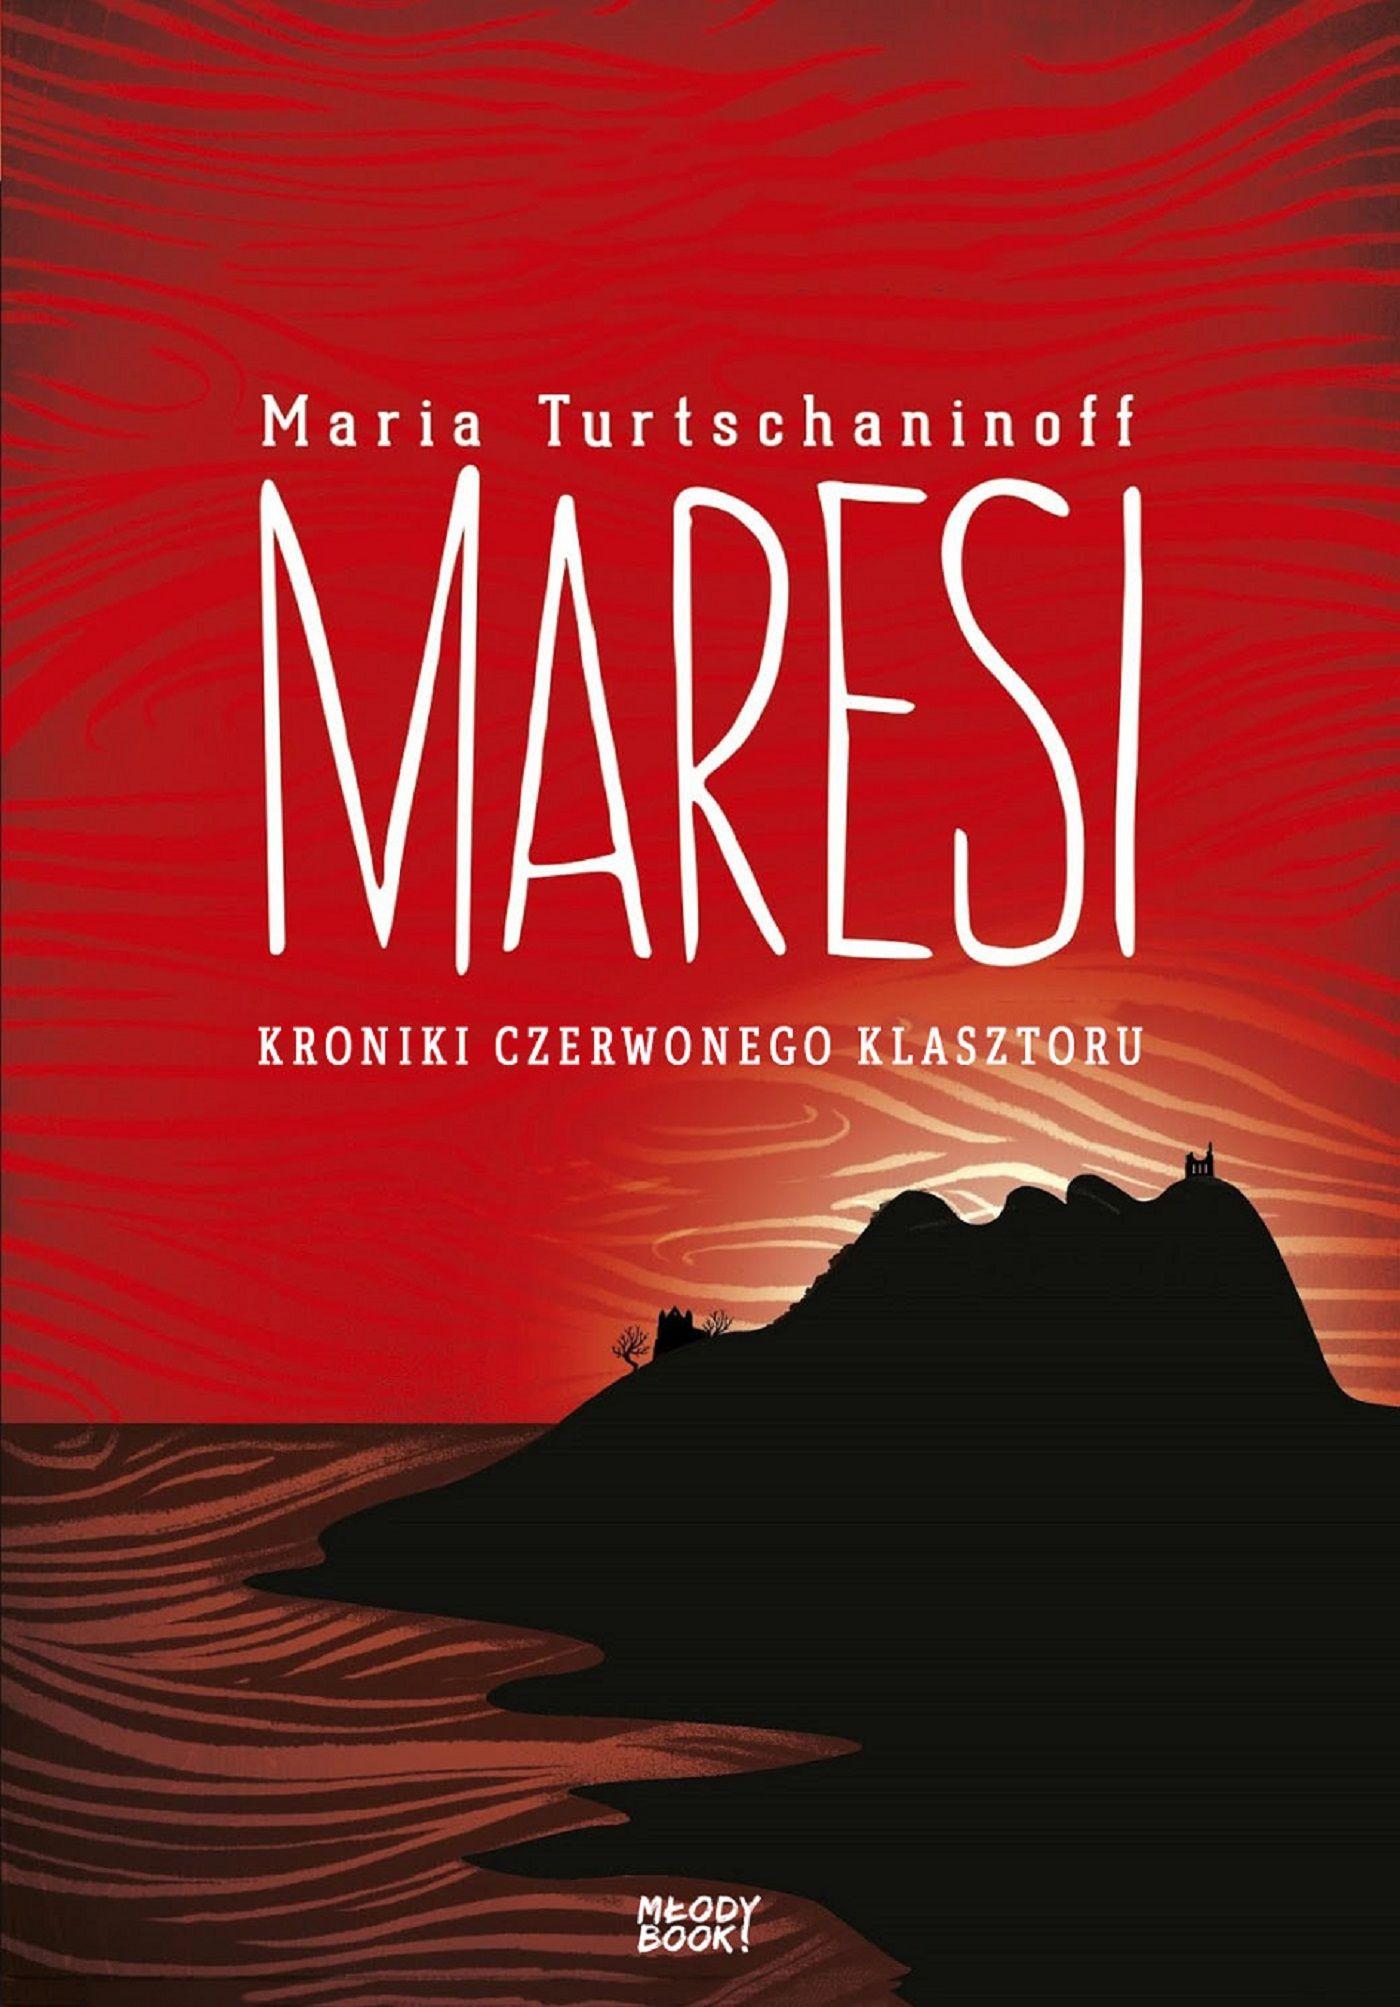 Maresi. Kroniki Czerwonego Klasztoru - Maria Turtschaninoff - ebook